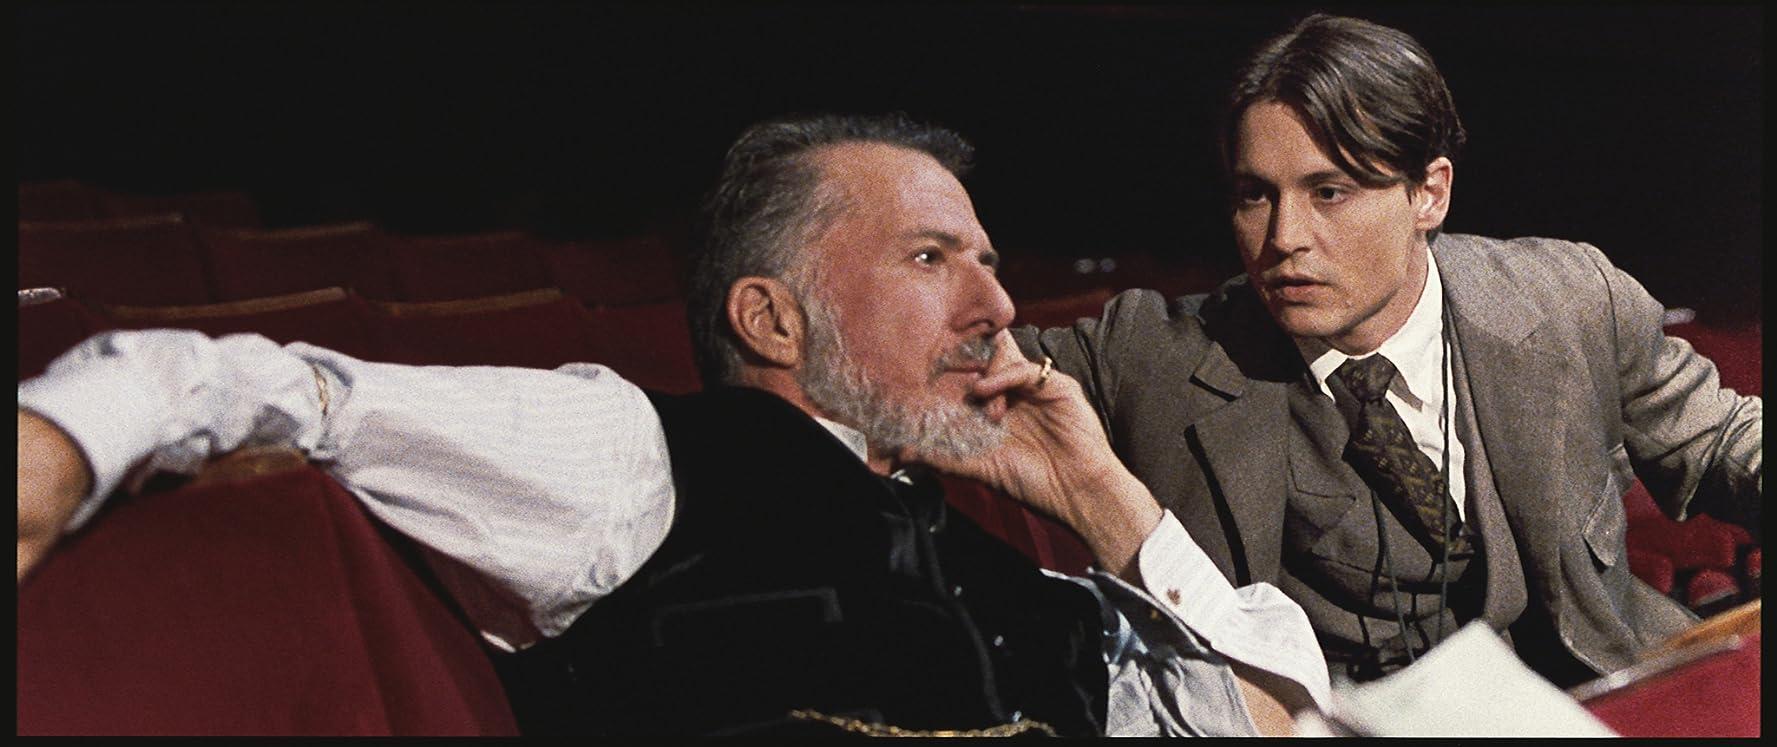 Clive Swift (born 1936),Leslie Uggams Sex movies Nicola McLean,Roger Allam (born 1953)